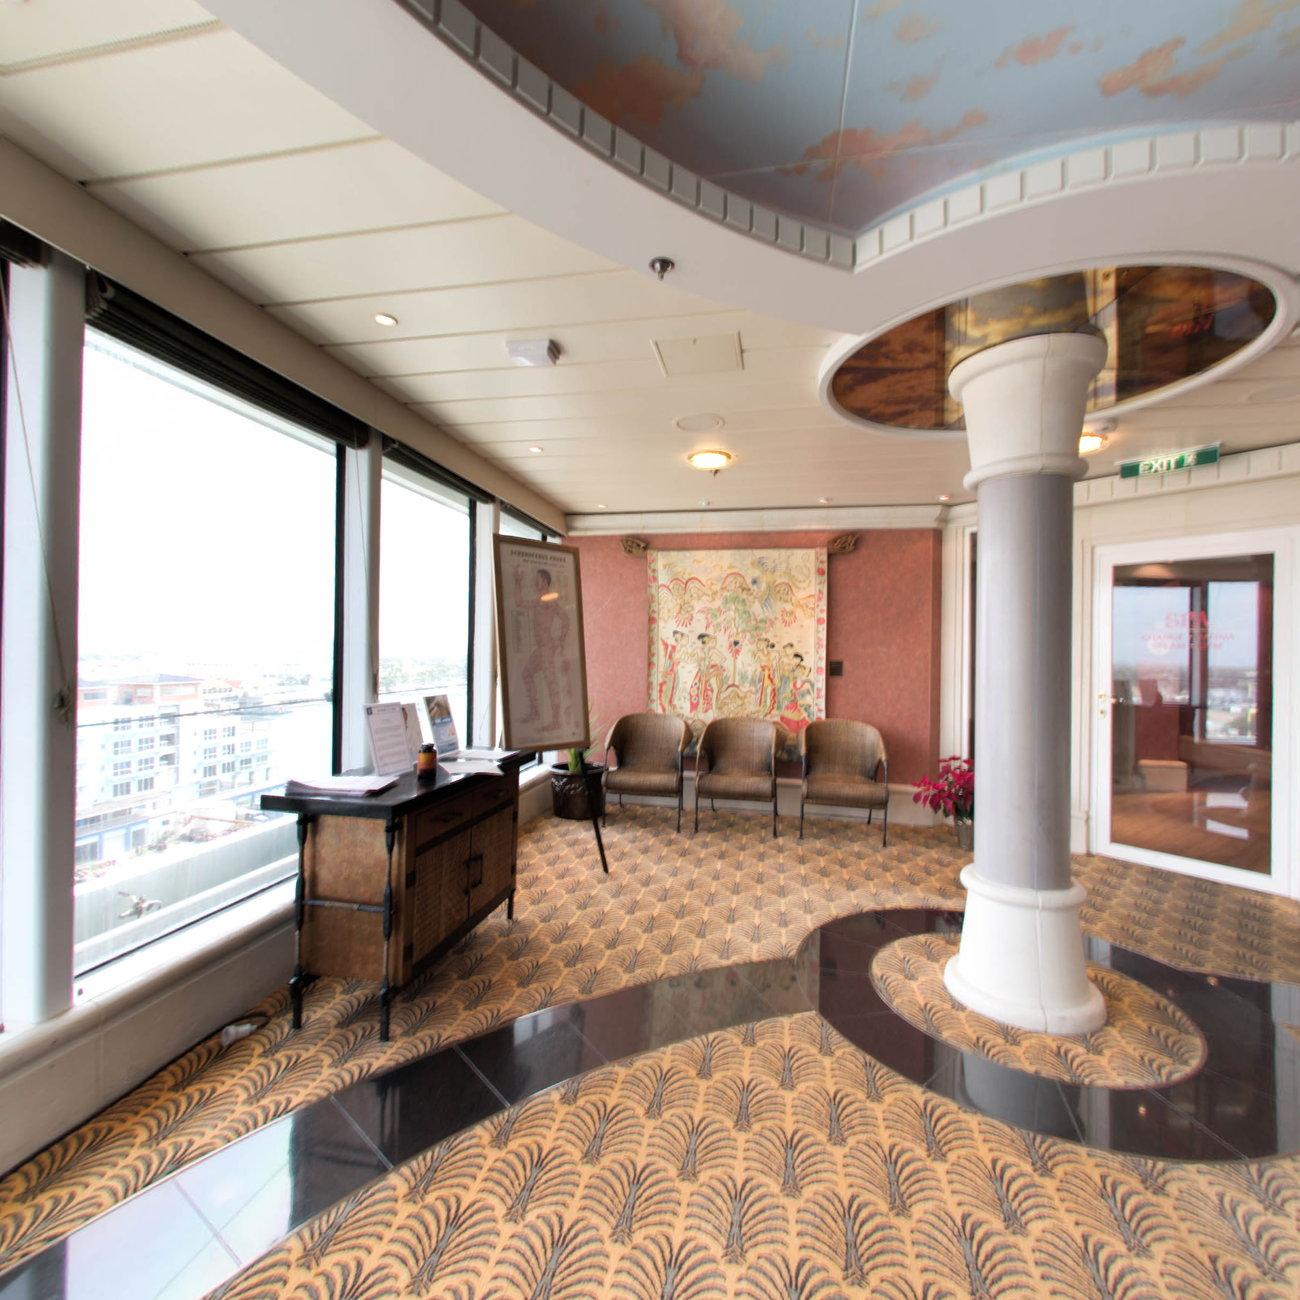 Salon Panorama Officiel: Vitality Spa & Salon On Royal Caribbean Serenade Of The Seas